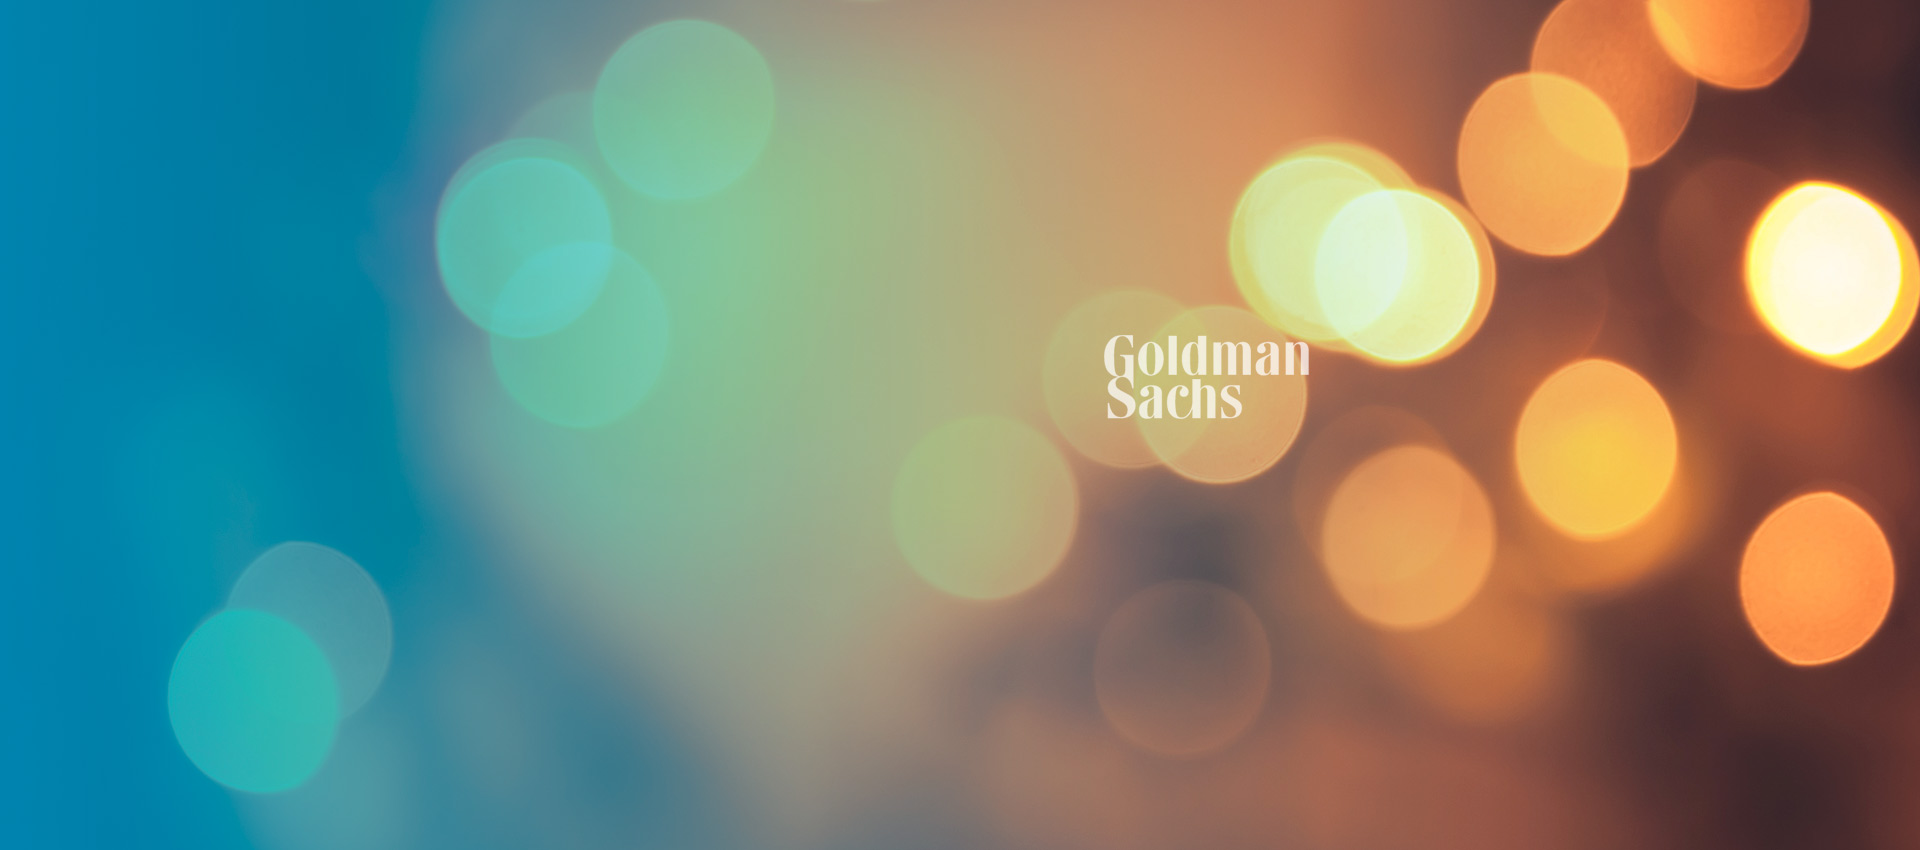 "C3 IoT - Goldman Sachs ""Most Intriguing Entrepreneur"" Award 2018"